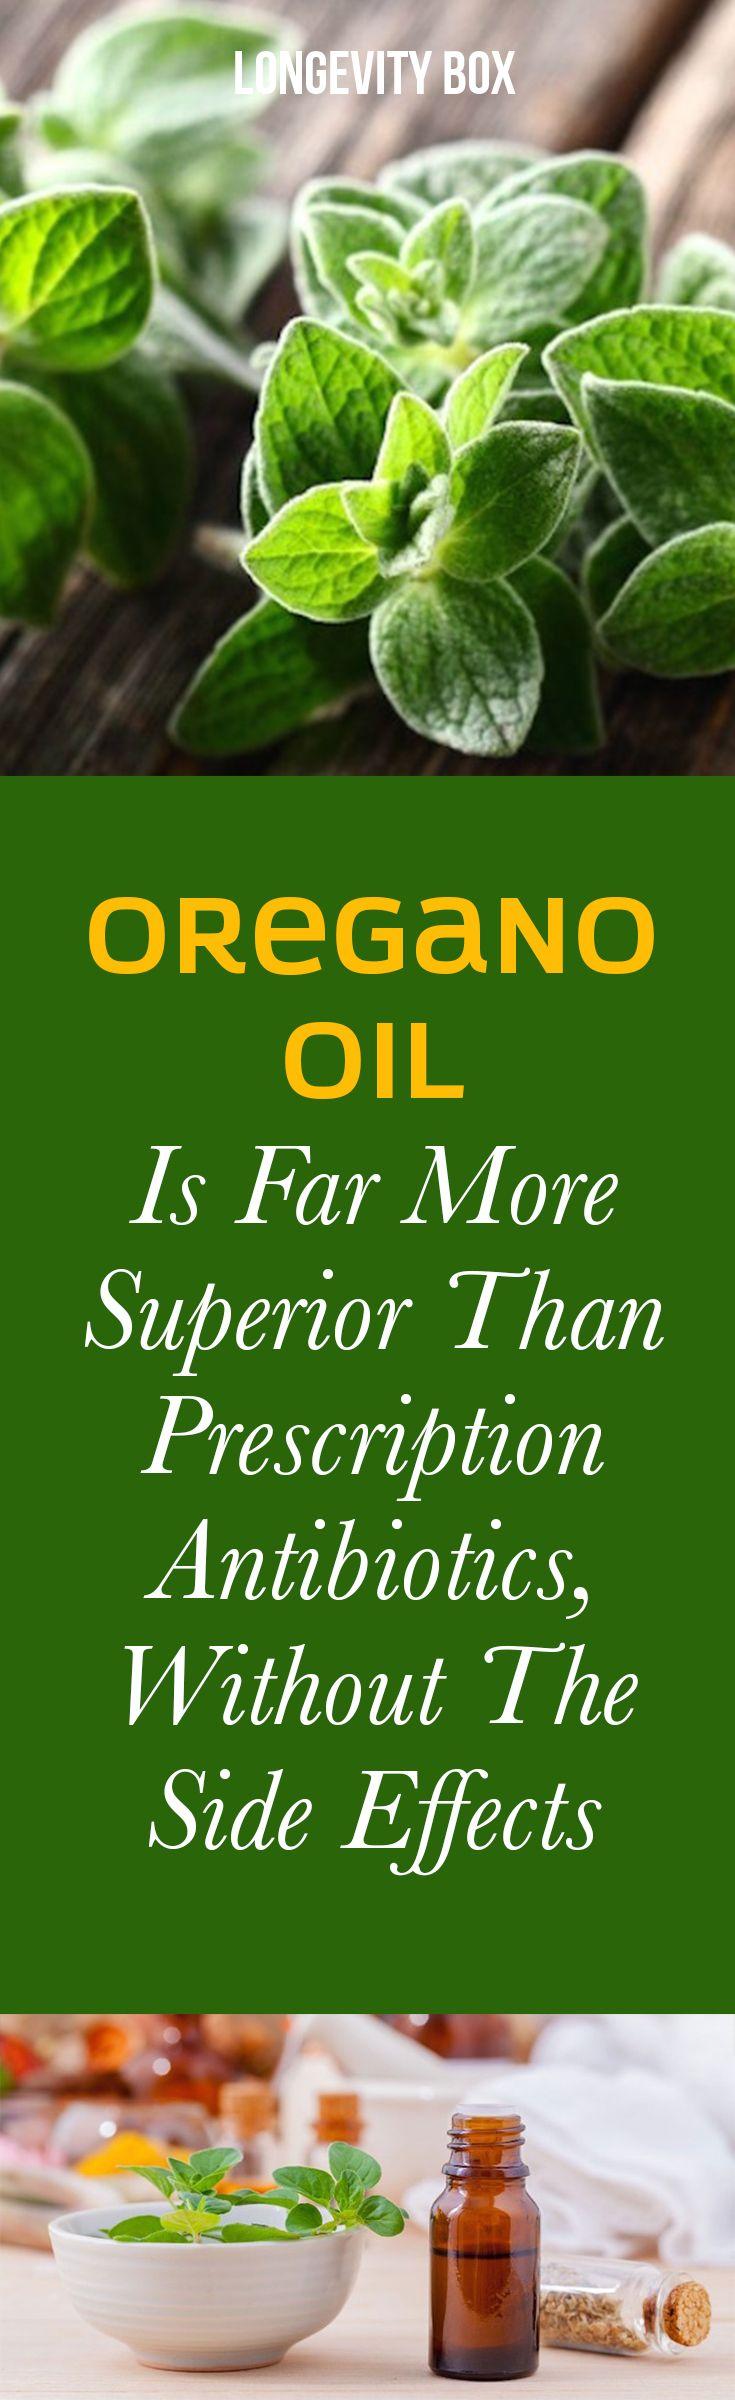 Oregano oil is far more superior than prescription antibiotics